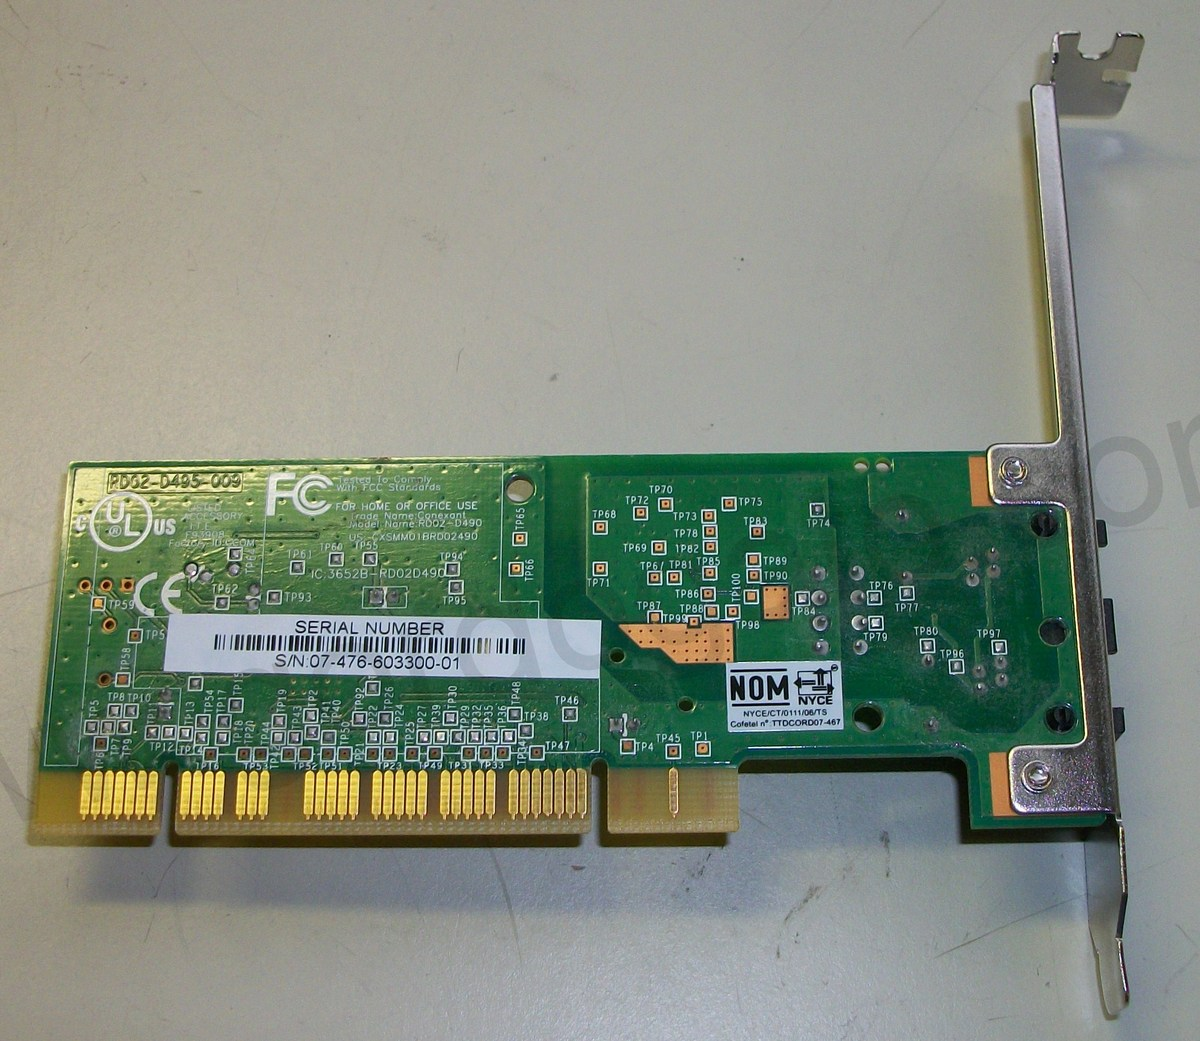 Dell Inspiron 560s Conexant Modem Drivers Mac